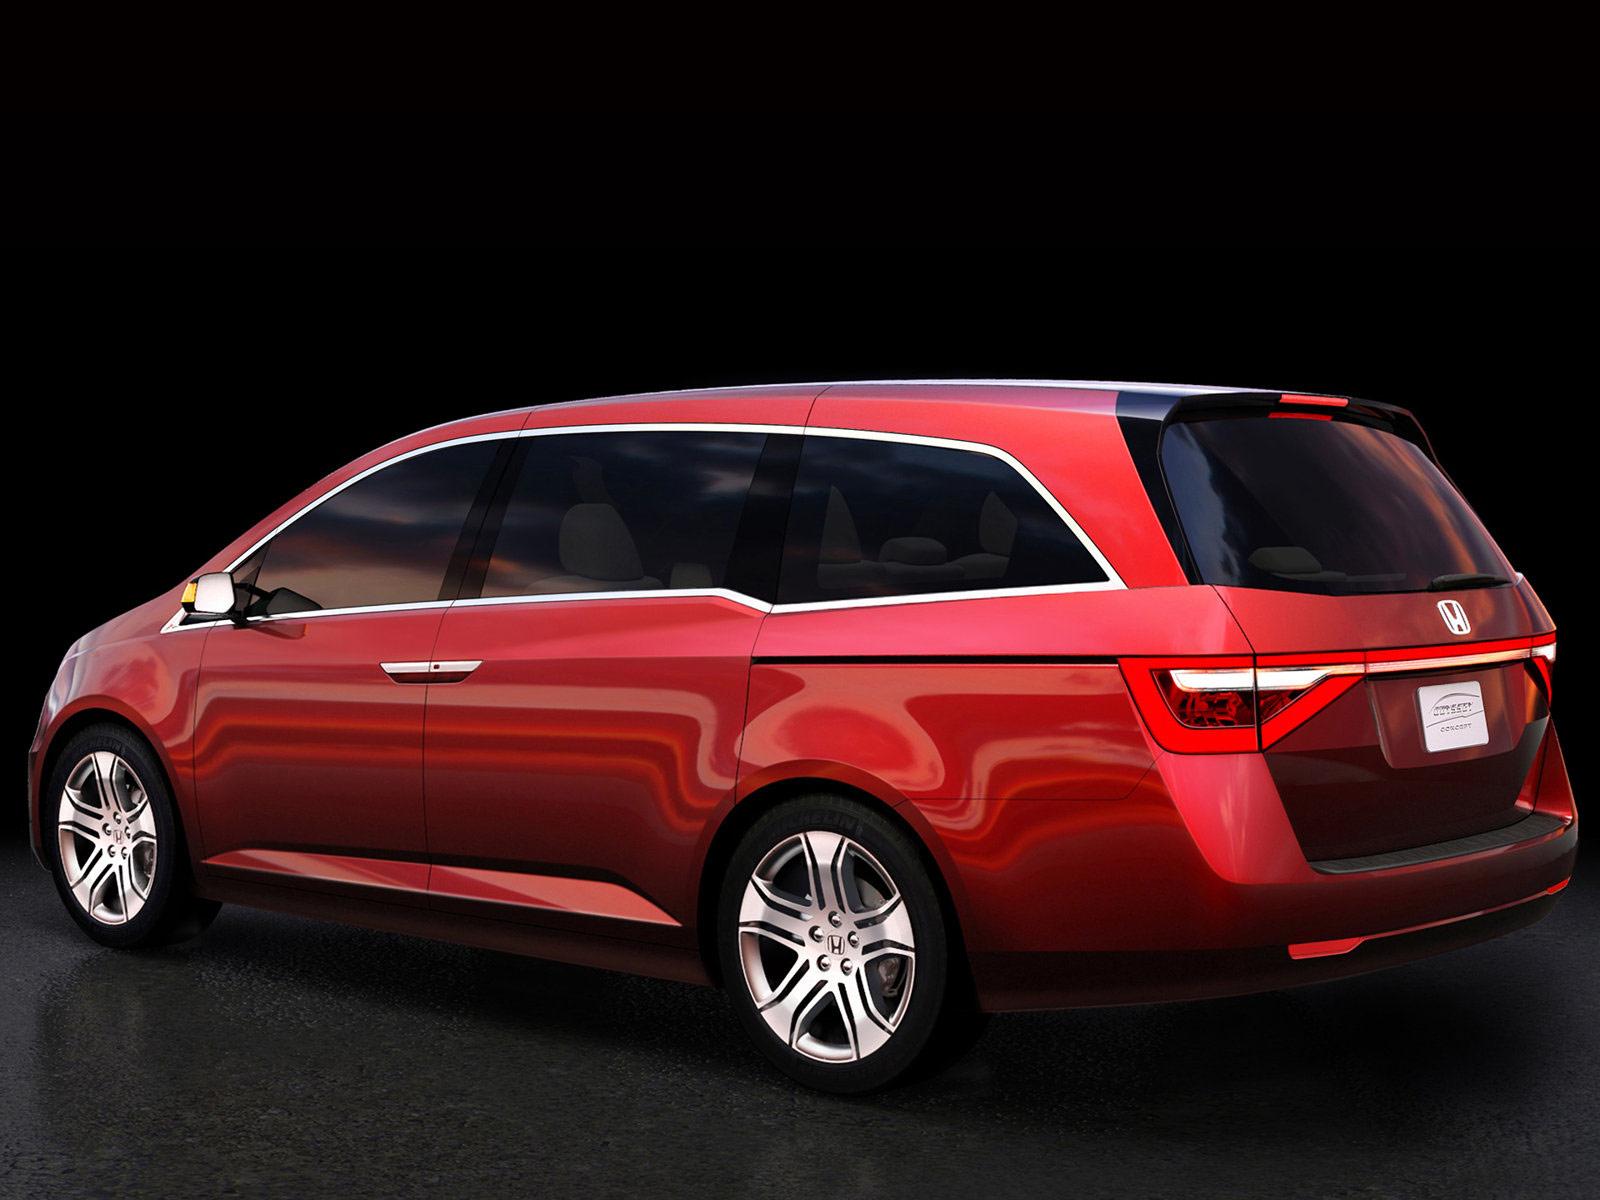 2010 HONDA Odyssey Concept Car Photos. Accident Lawyers Info